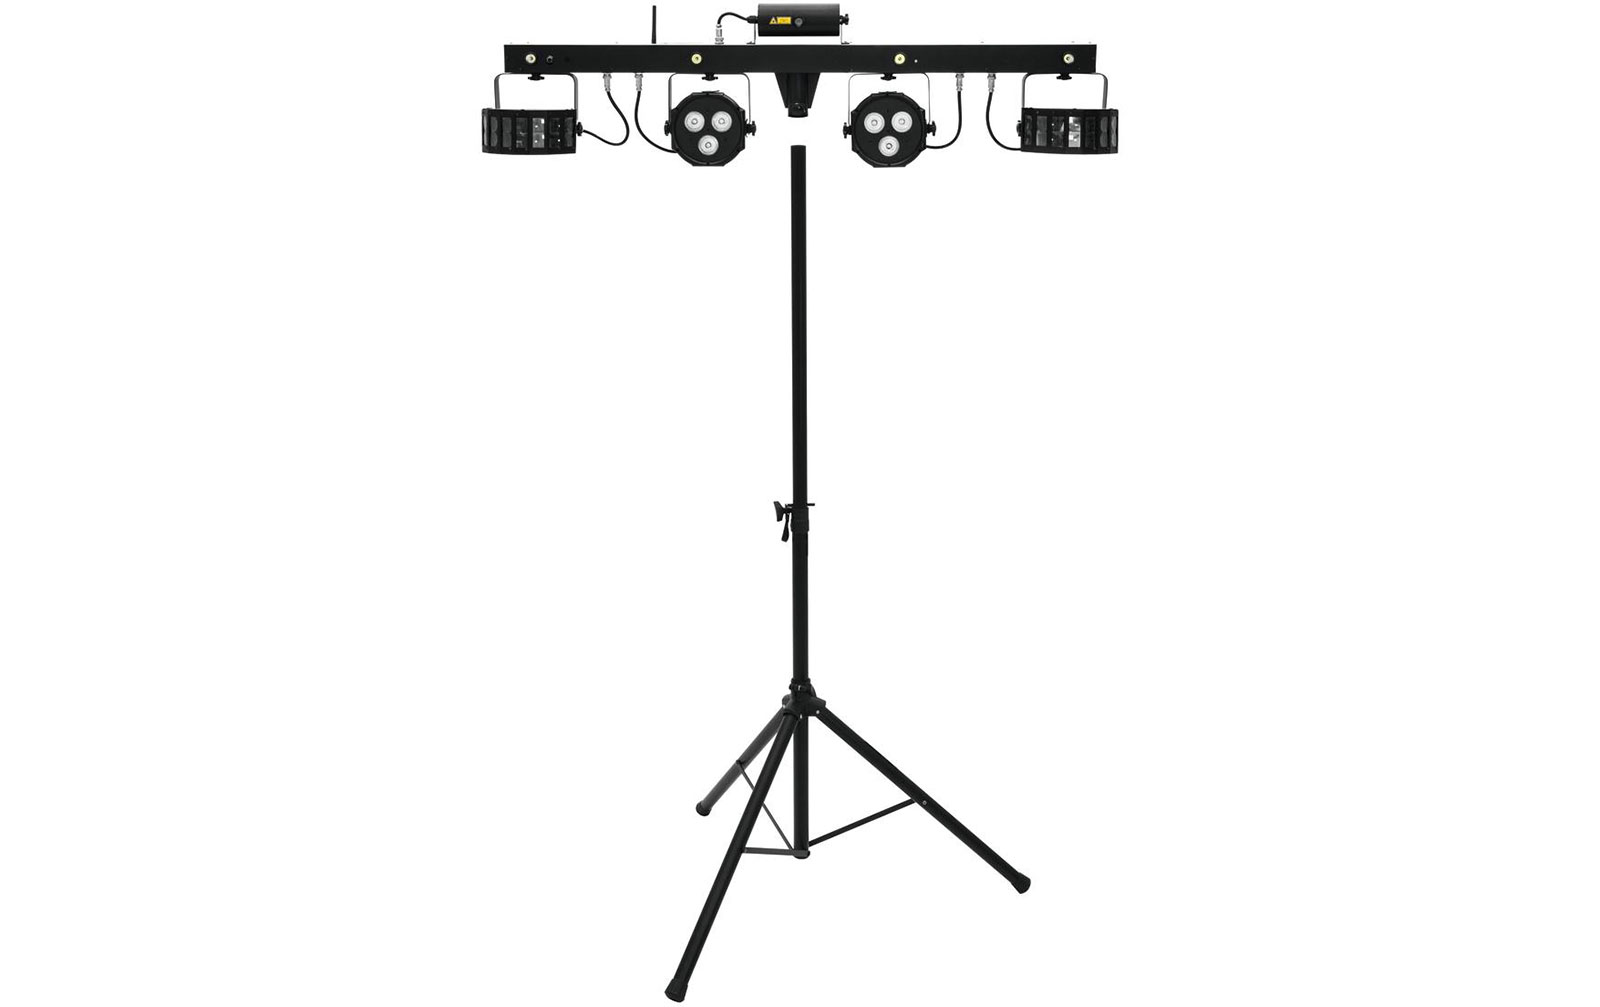 eurolite-set-led-kls-laser-bar-fx-m-3-boxenhochsta-nder